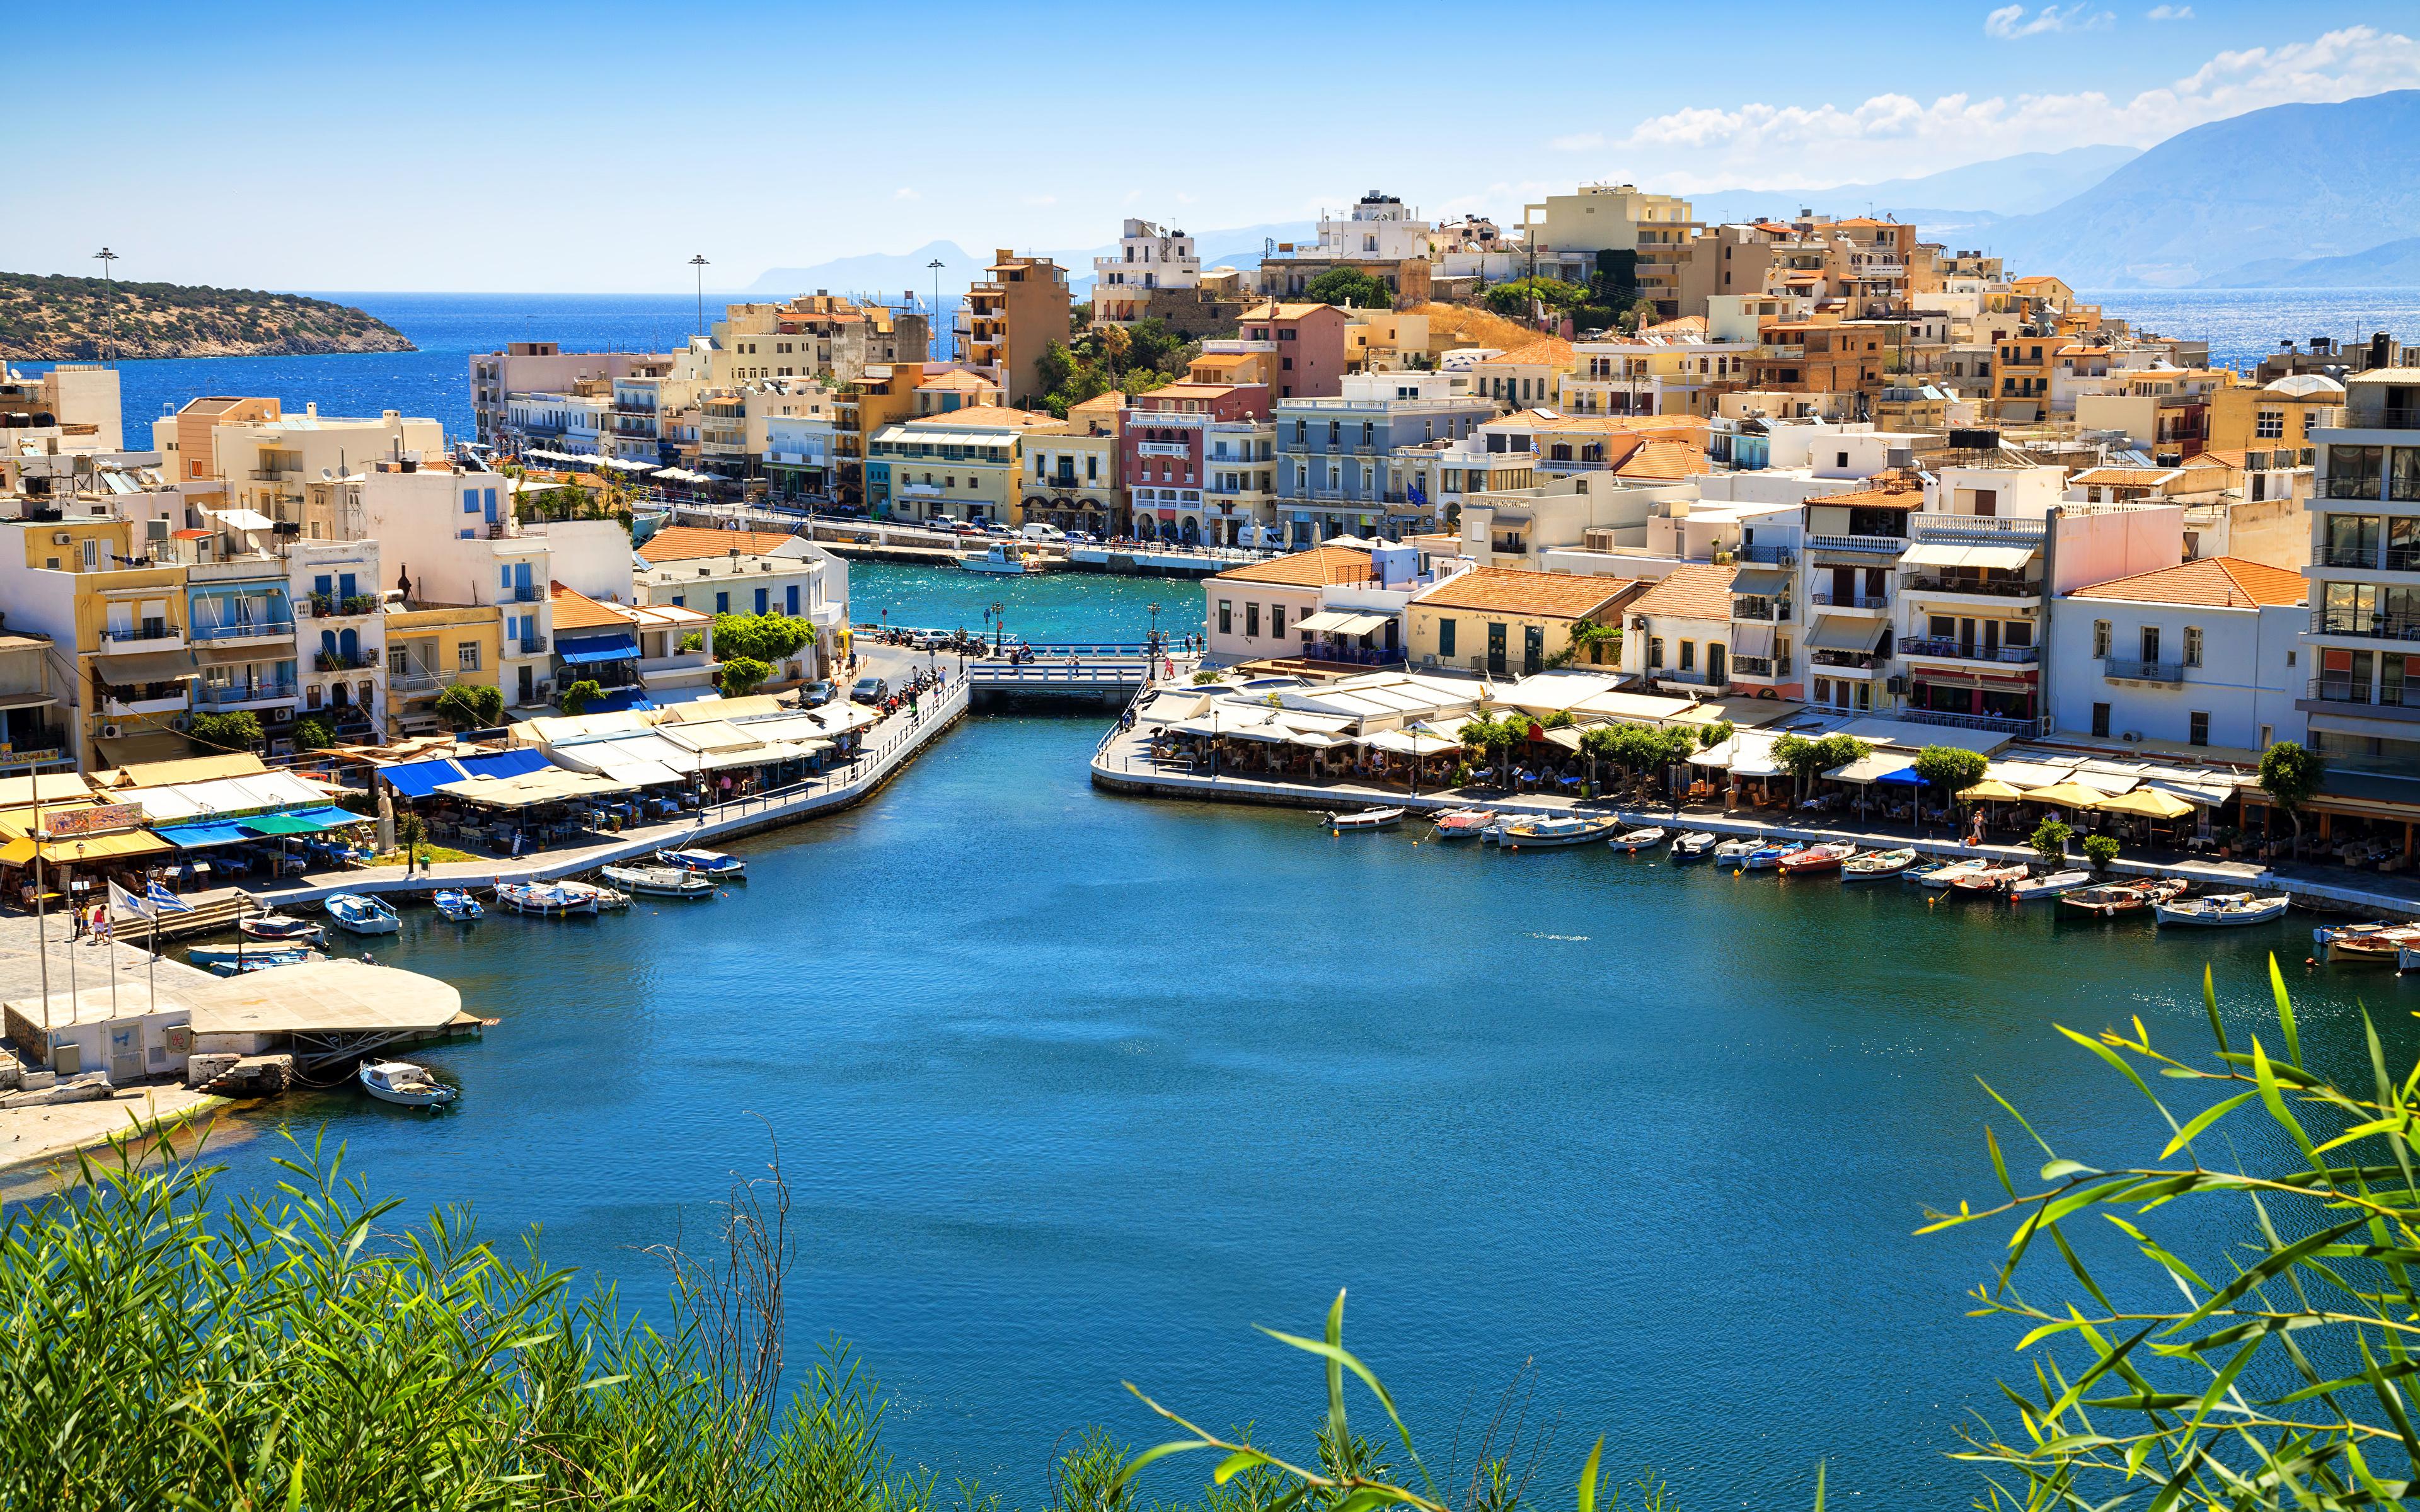 Images Greece Agios Nikolaos Crete Coast Boats Marinas 3840x2400 3840x2400